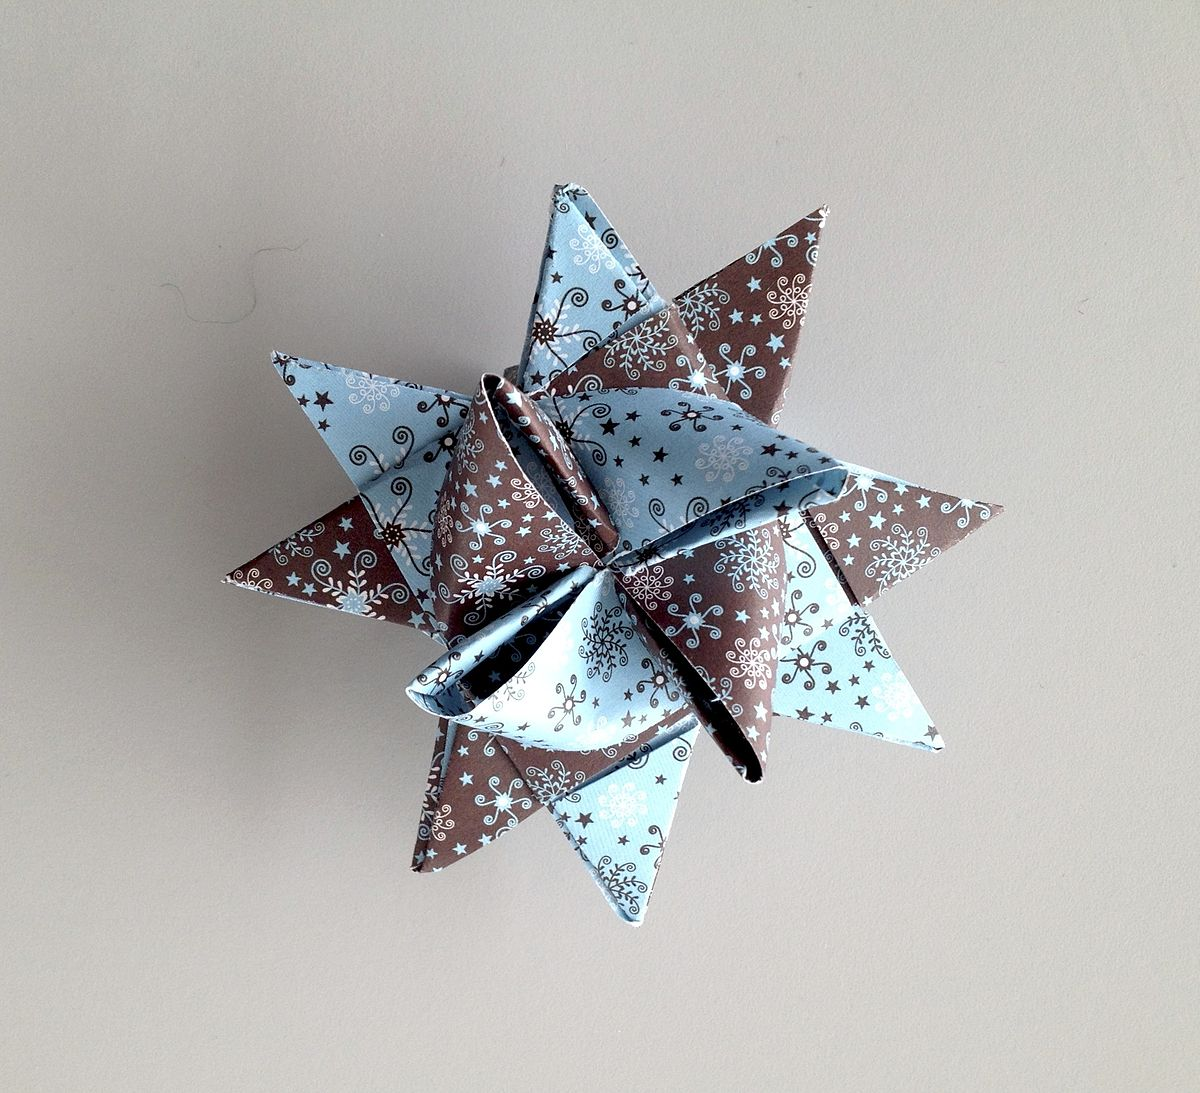 Froebel star - Wikipedia